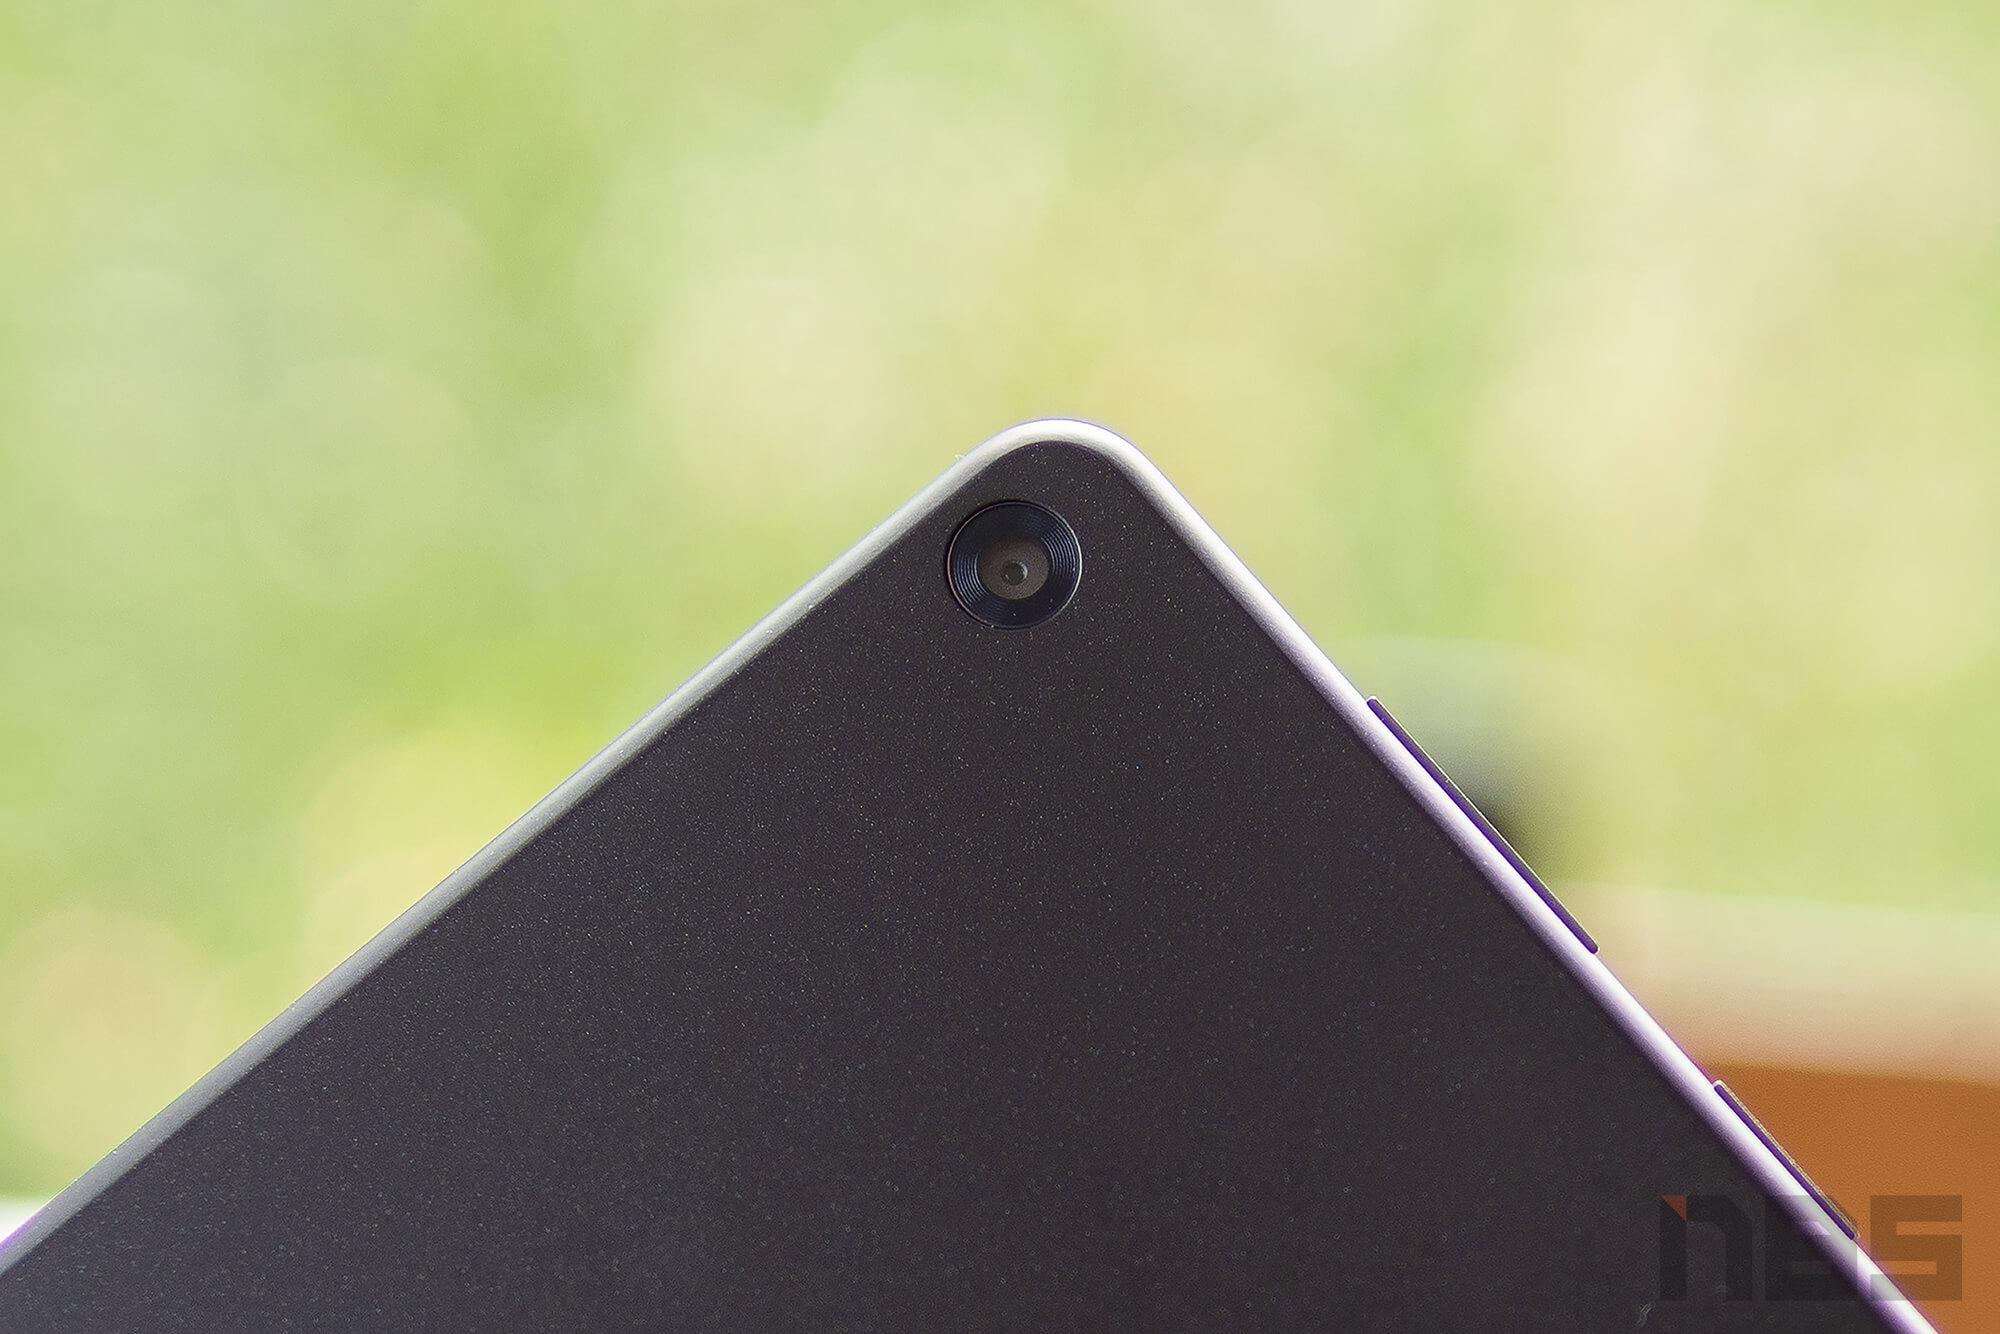 Review Lenovo Tab M10 REL FHD NotebookSPEC 8